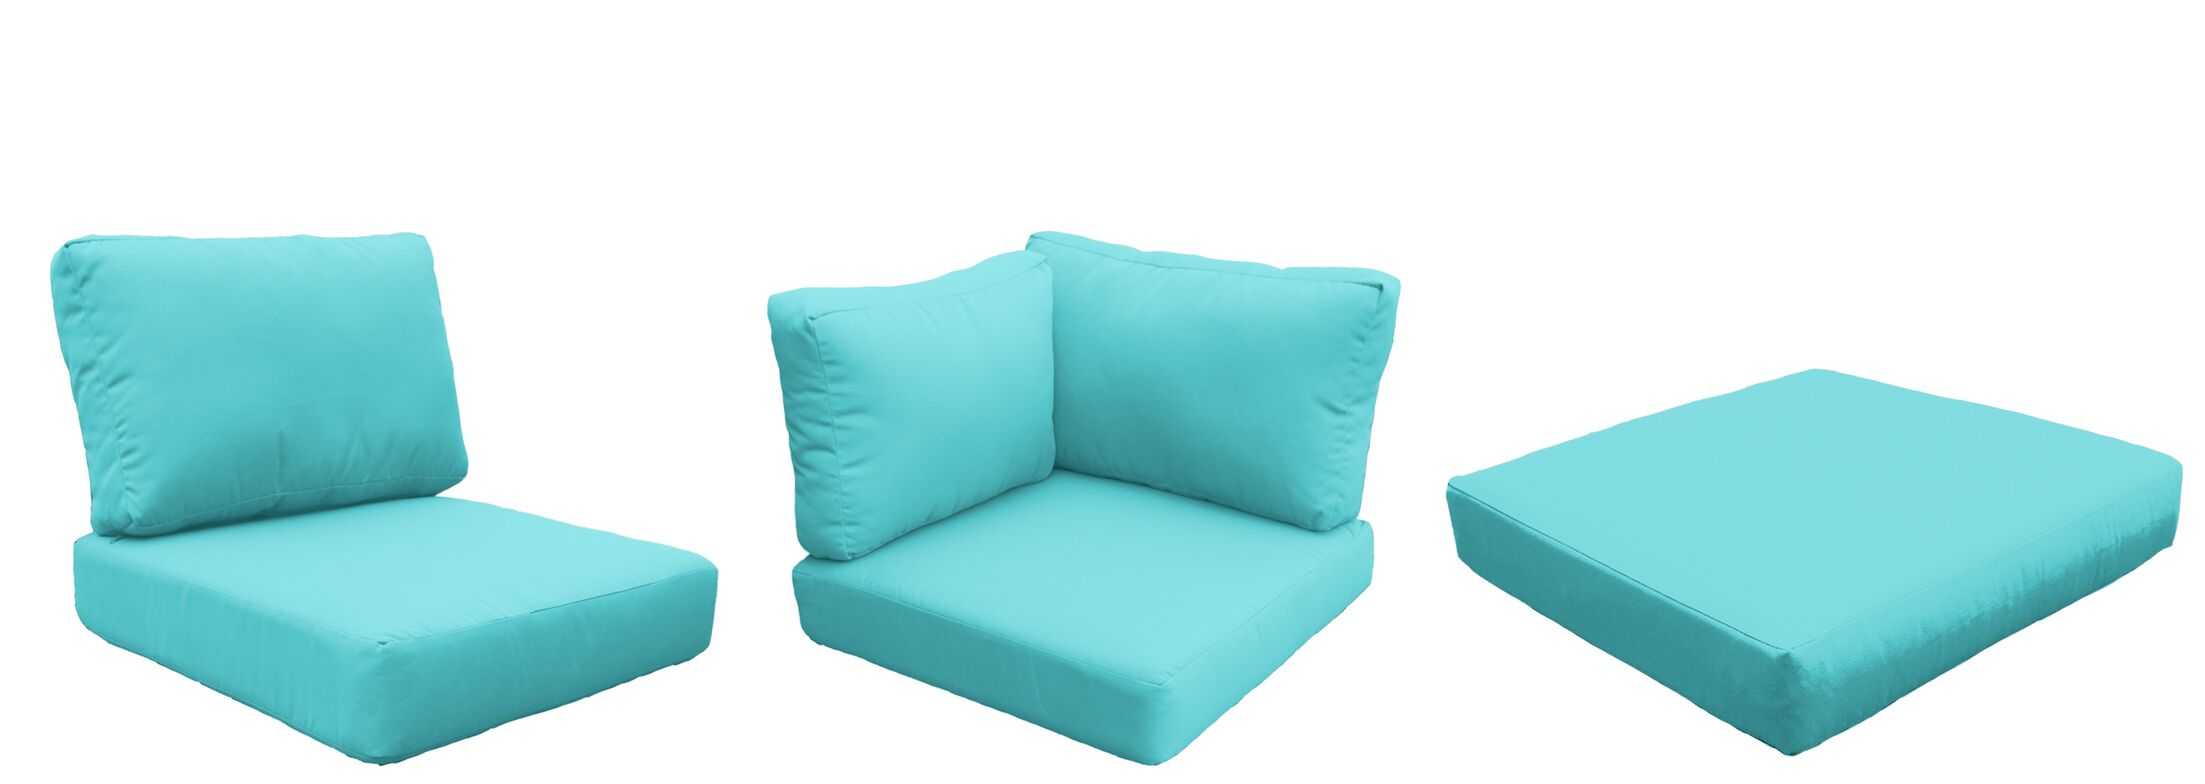 Capecod 21 Piece Outdoor Lounge Chair Cushion Set Fabric: Aruba